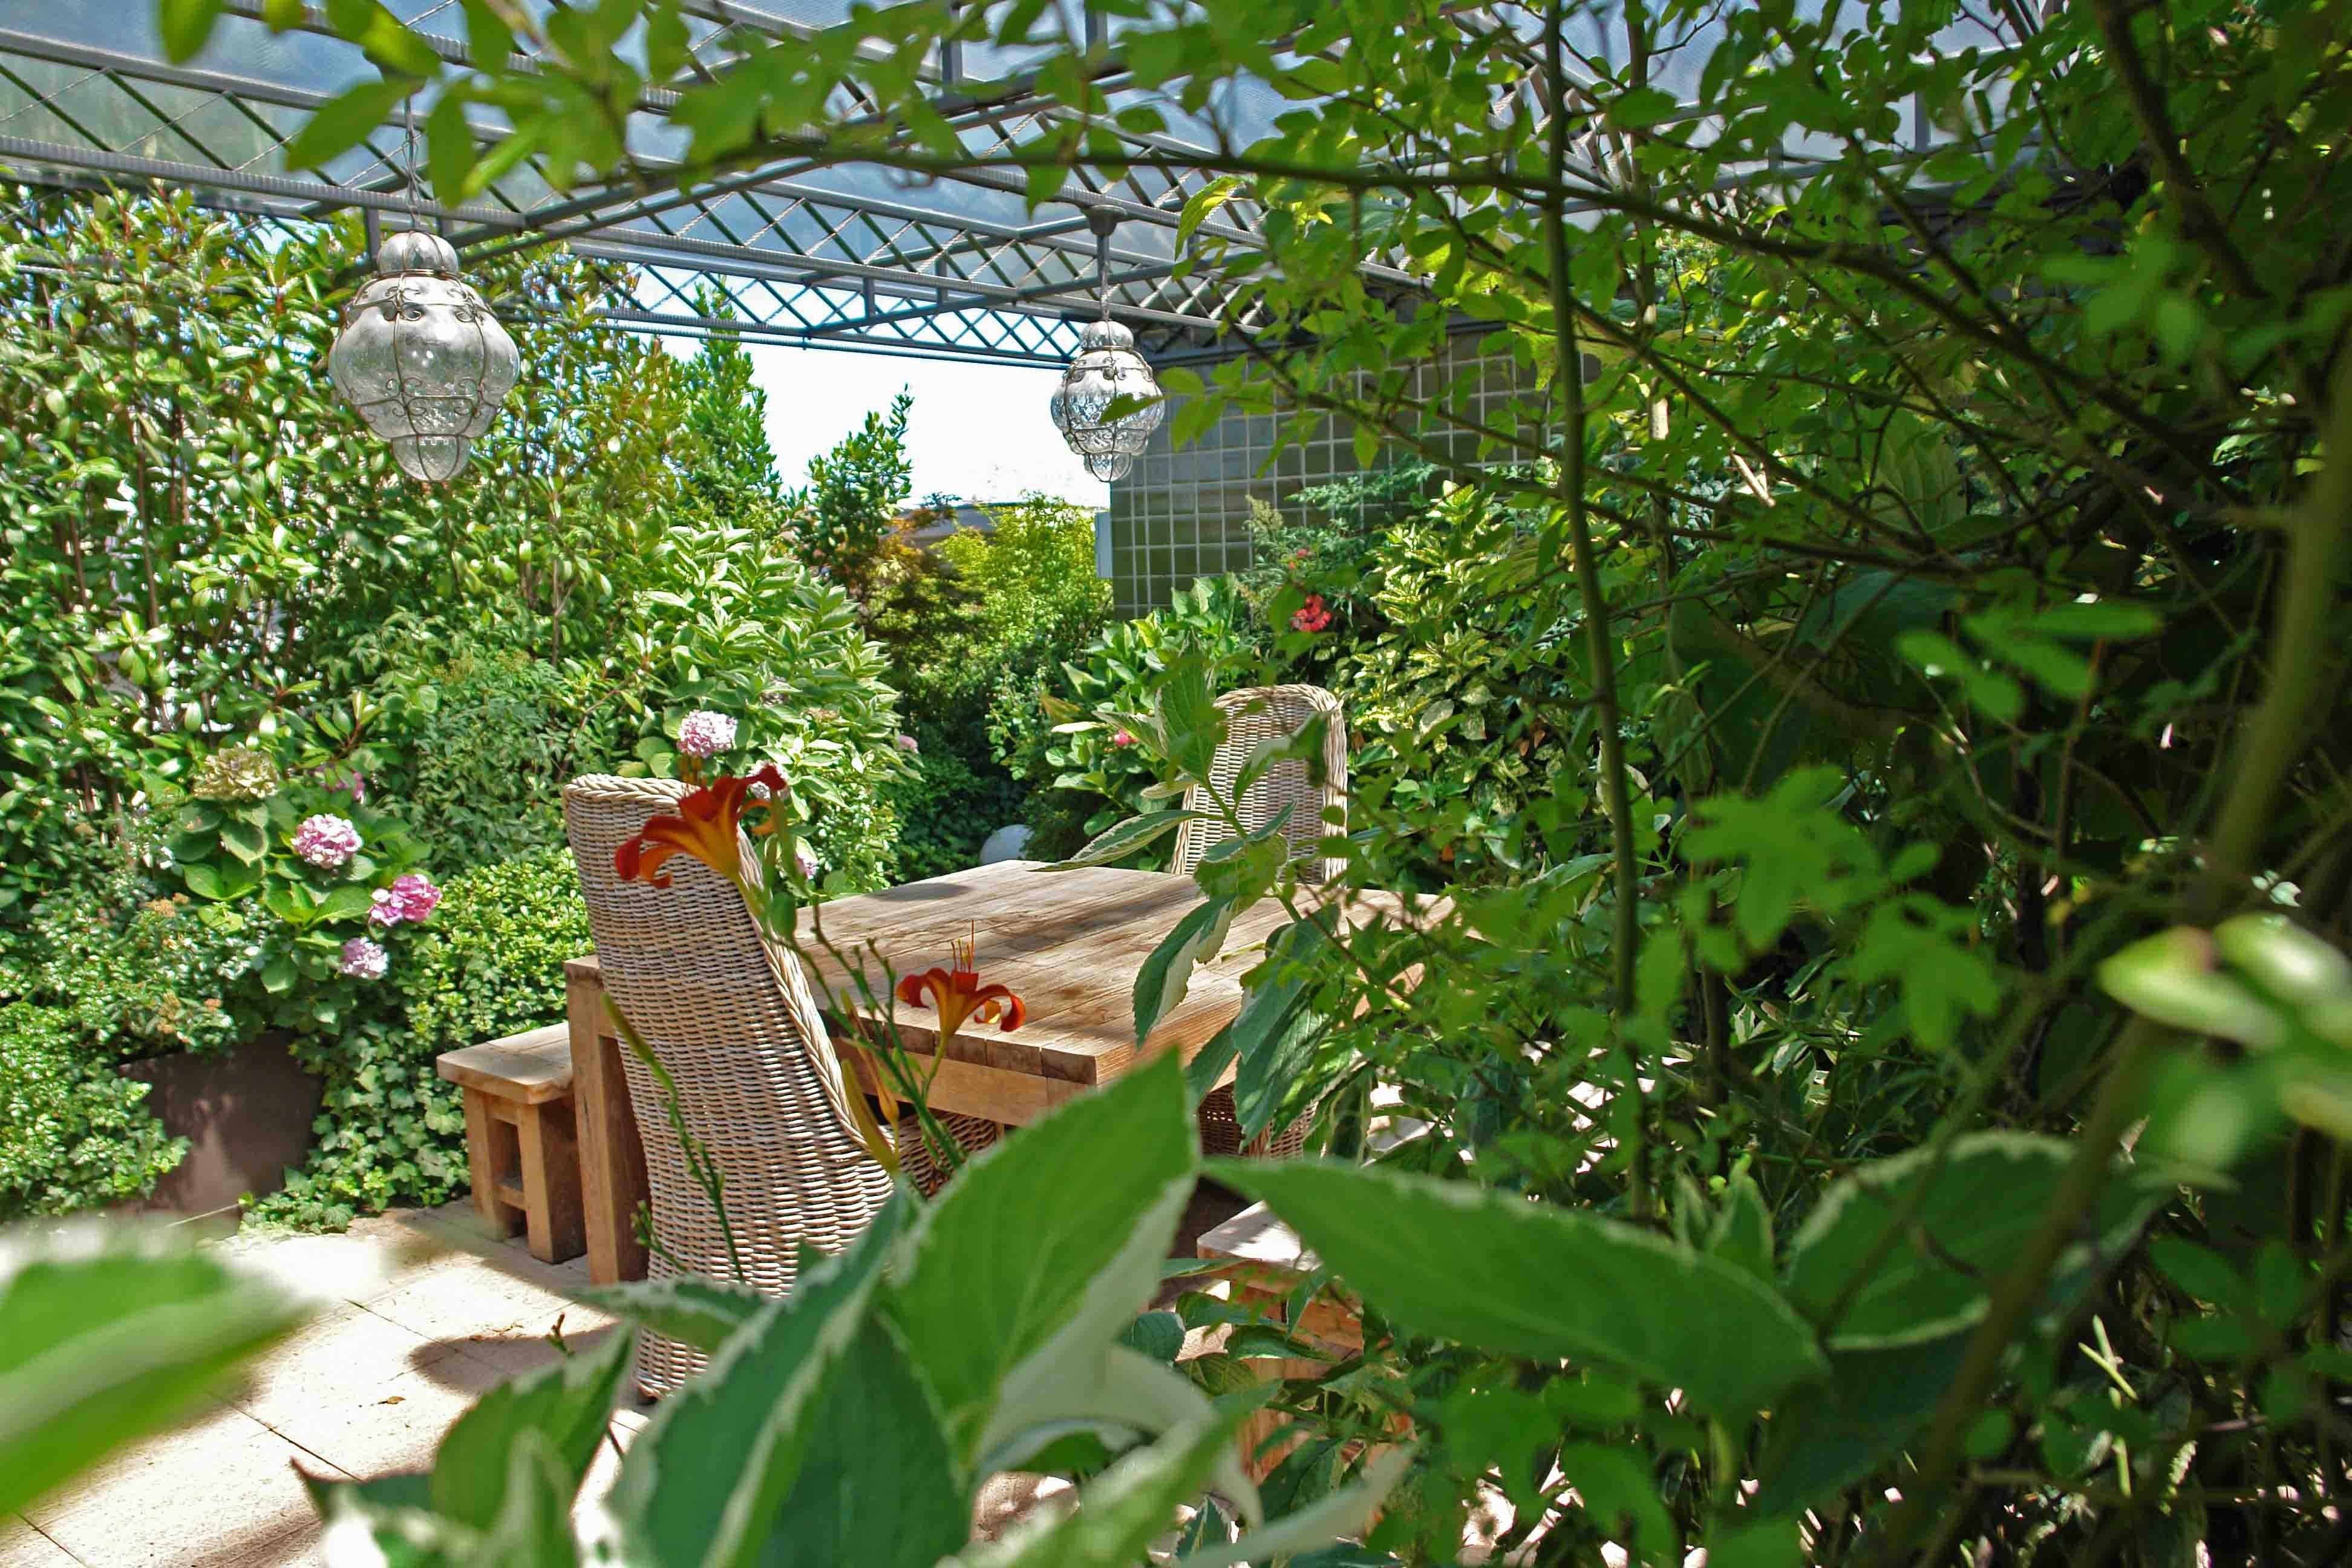 Vegetal rooms - تراس ها